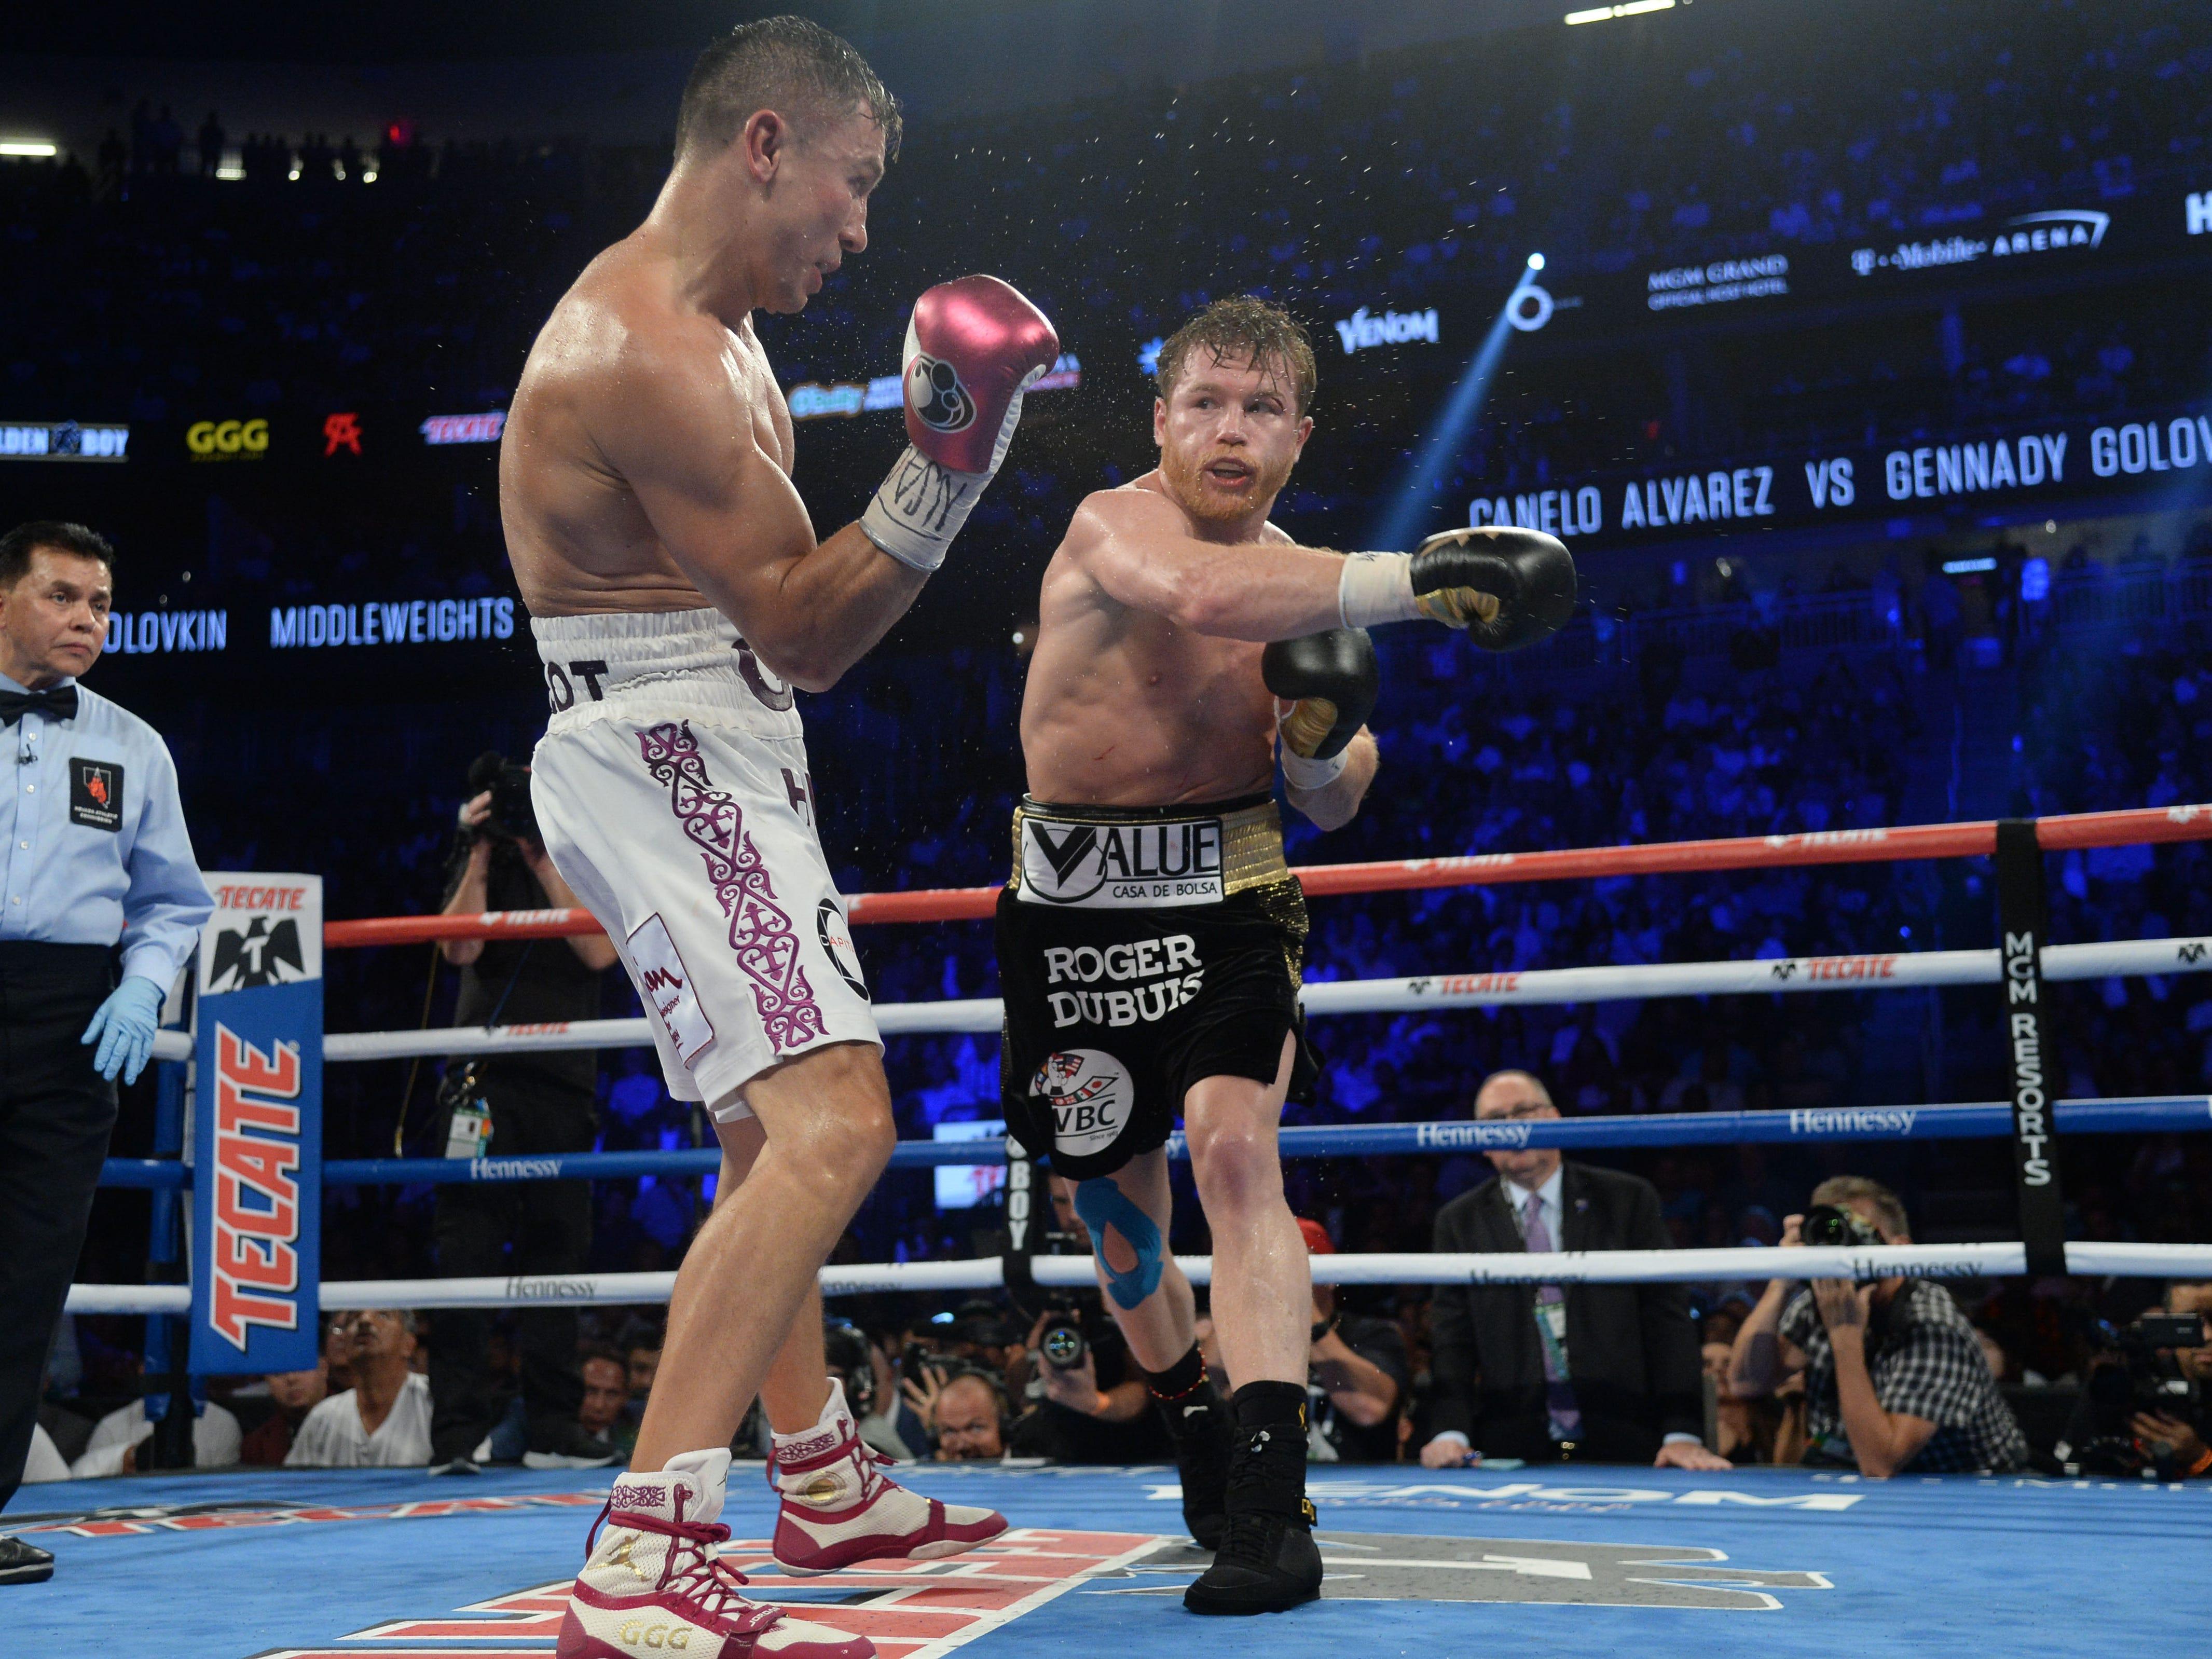 Alvarez takes a swing at Golovkin.